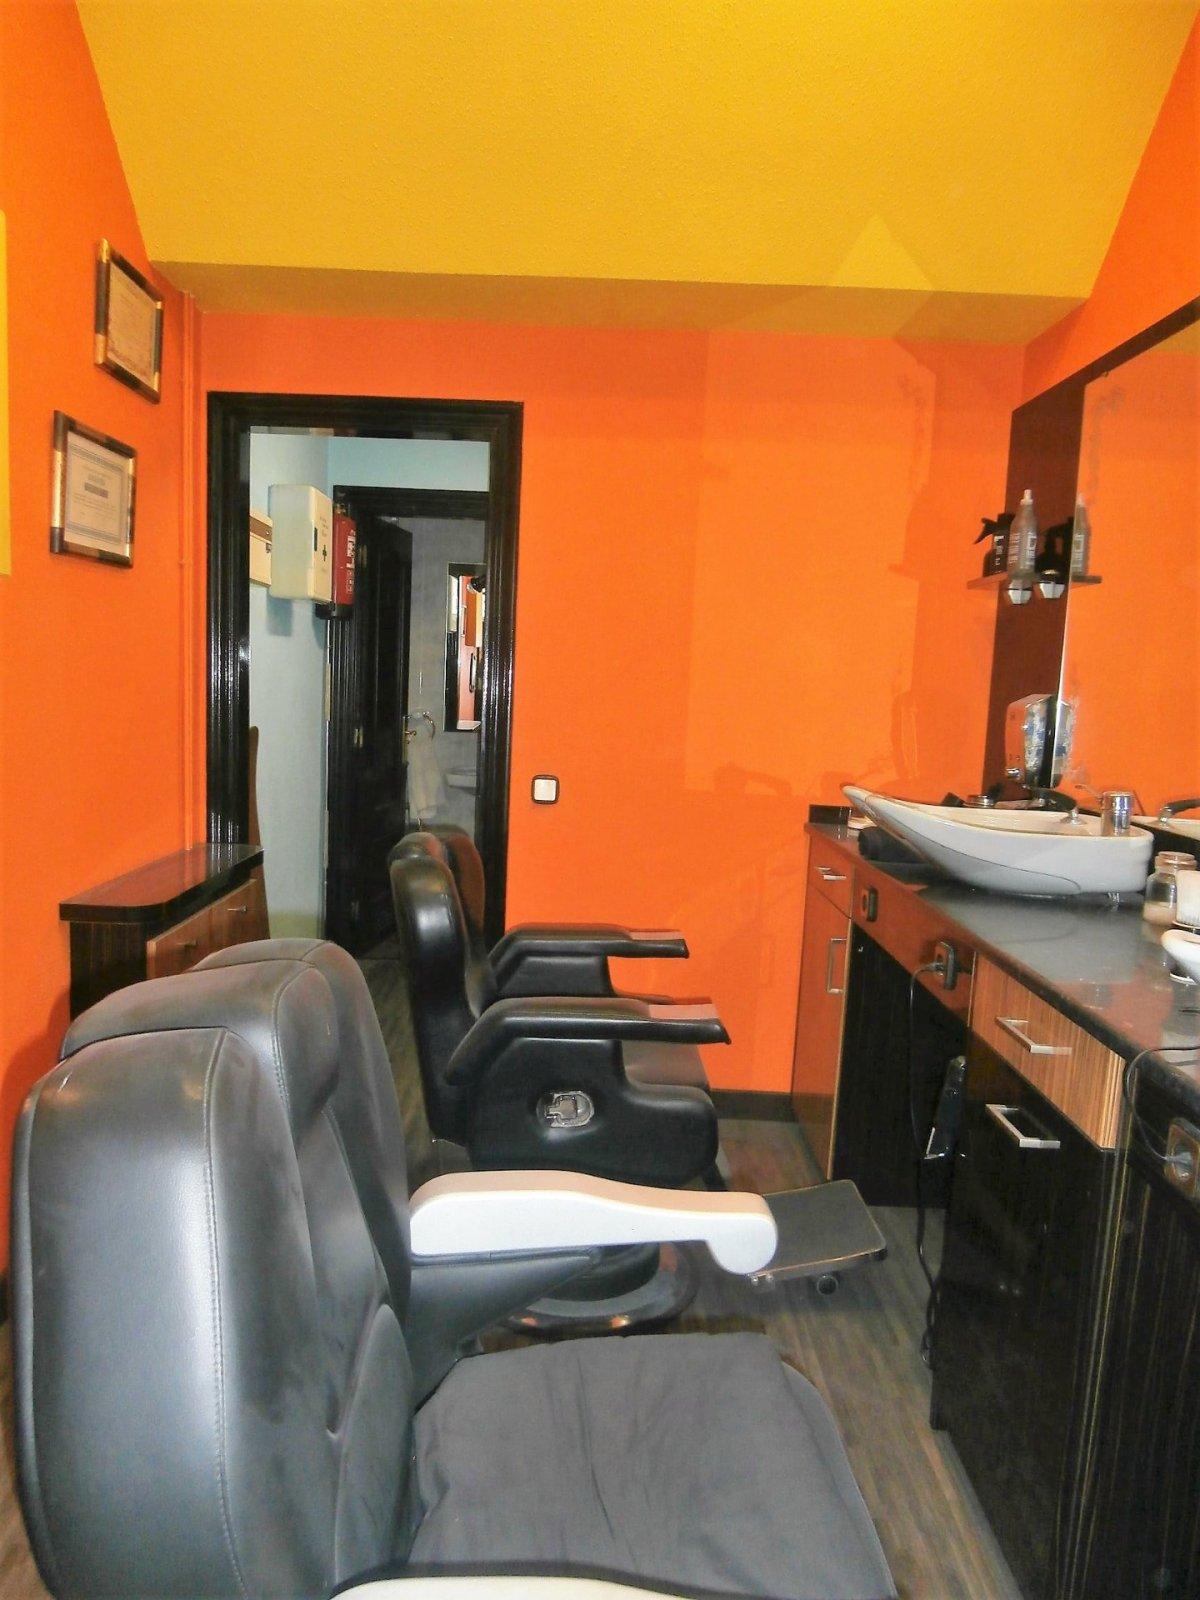 Local instalado como peluqueria - imagenInmueble4